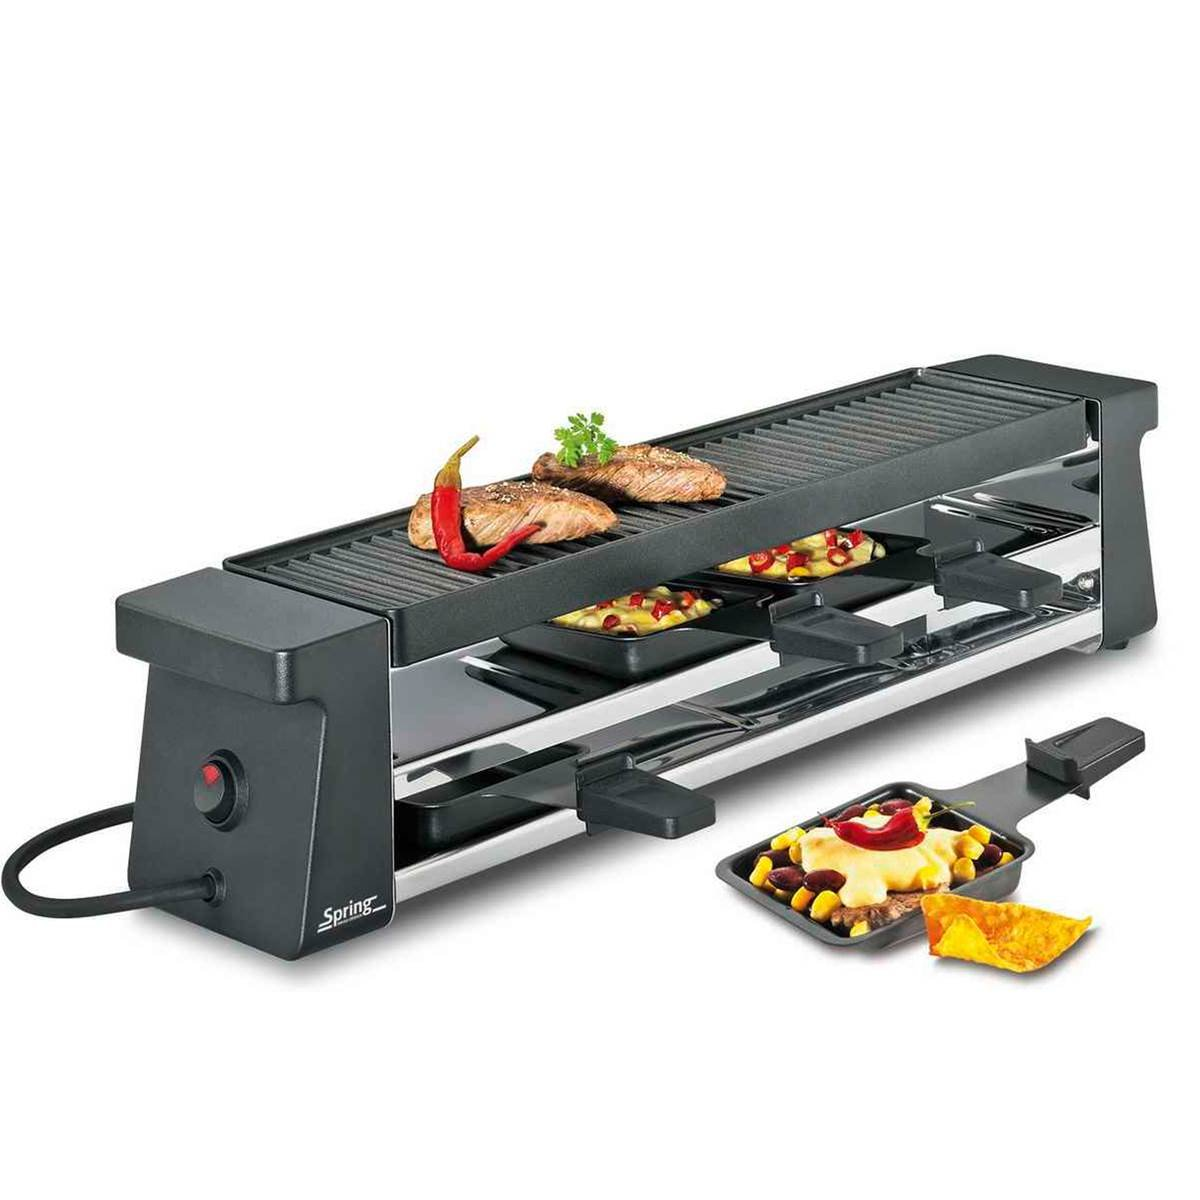 Unbekannt Spring Raclette 4 Compact Nero EU 3039007001